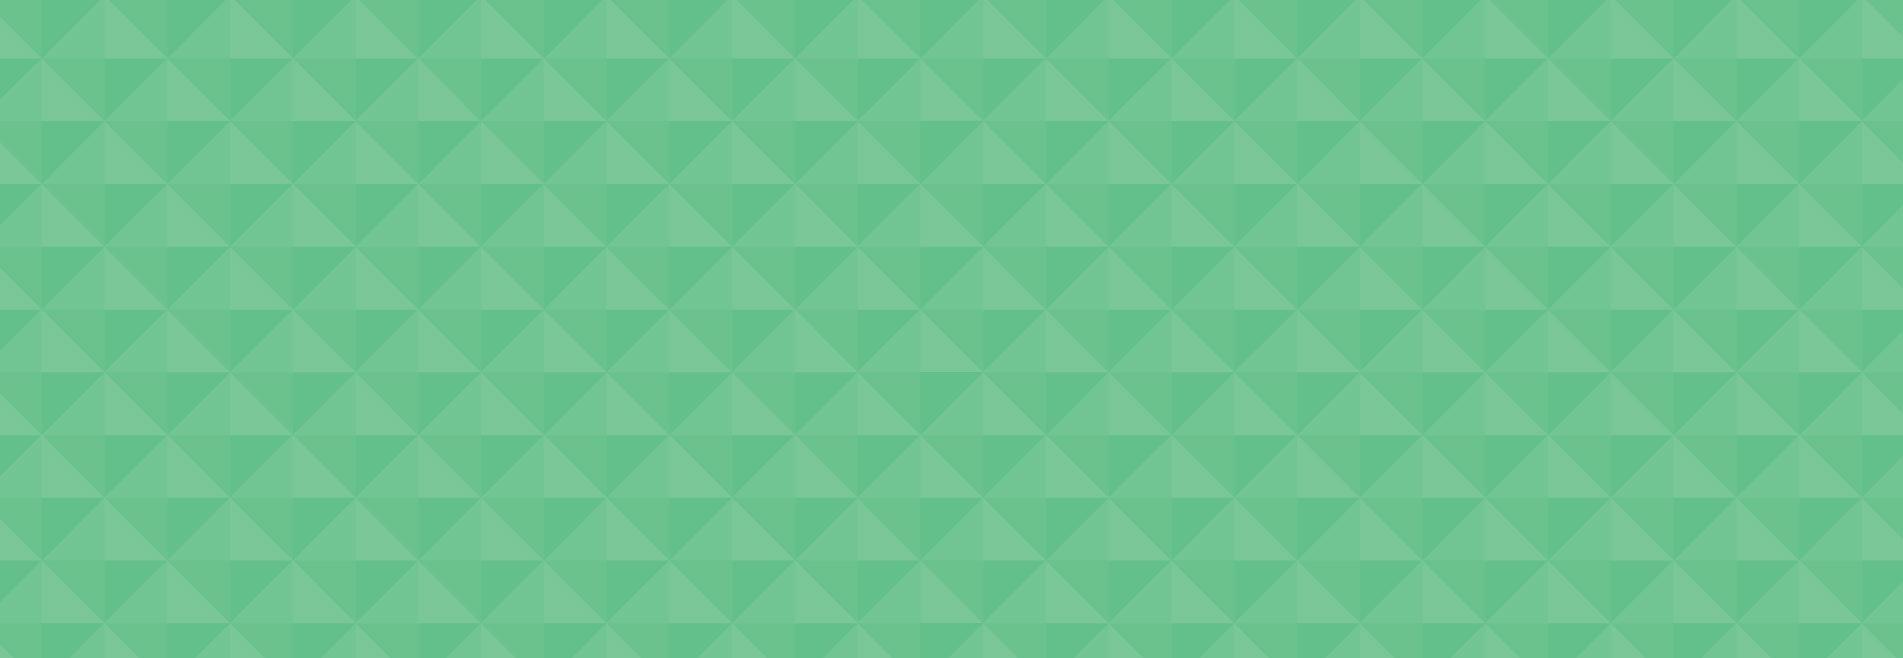 7614_WEB_Covisum_landing-page-graphics_SST-middle.jpg